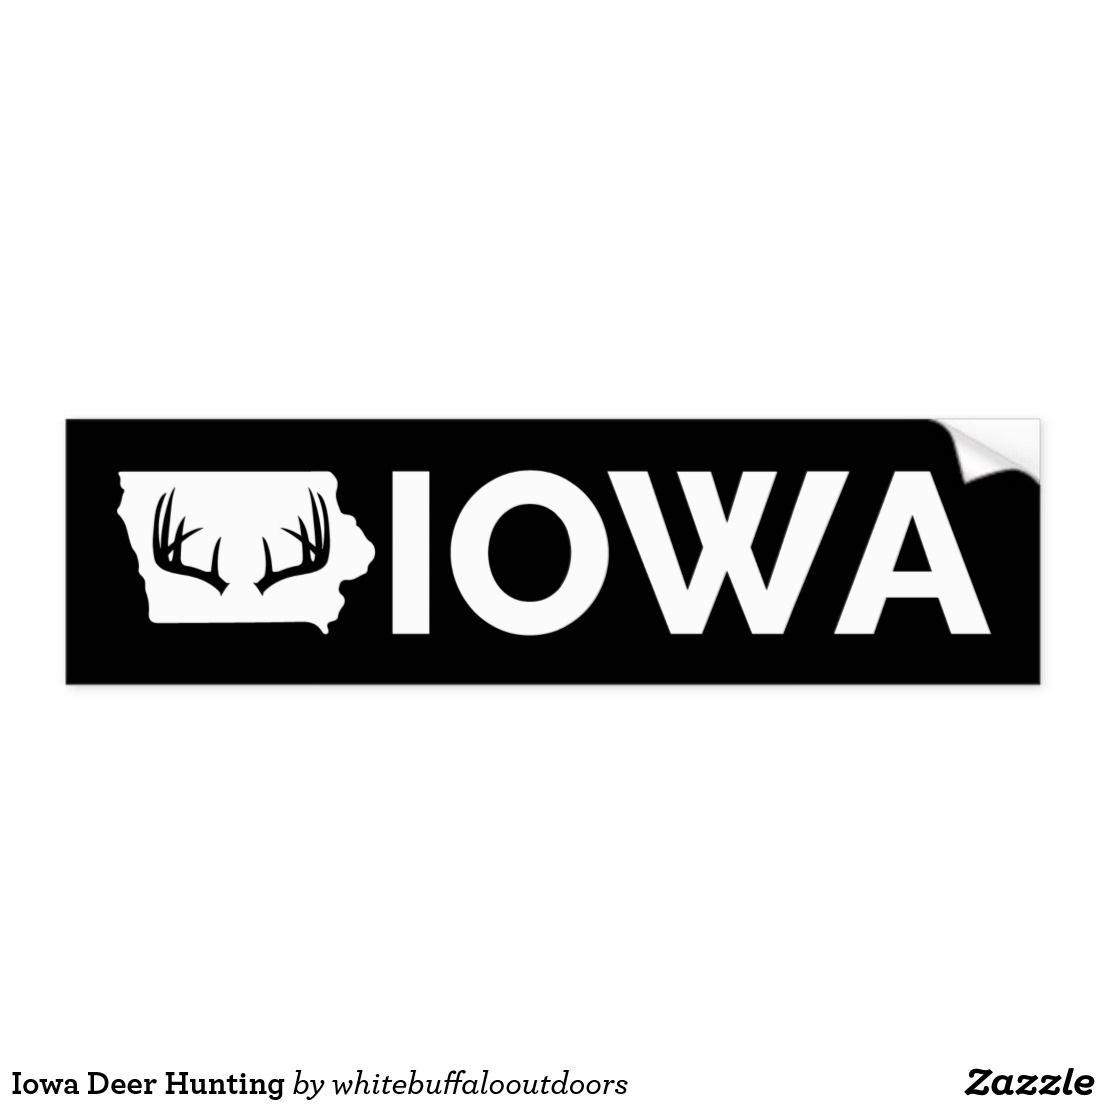 Iowa Deer Hunting Bumper Sticker Zazzle Com Iowa Deer Hunting Deer Hunting Hunting [ 1106 x 1106 Pixel ]